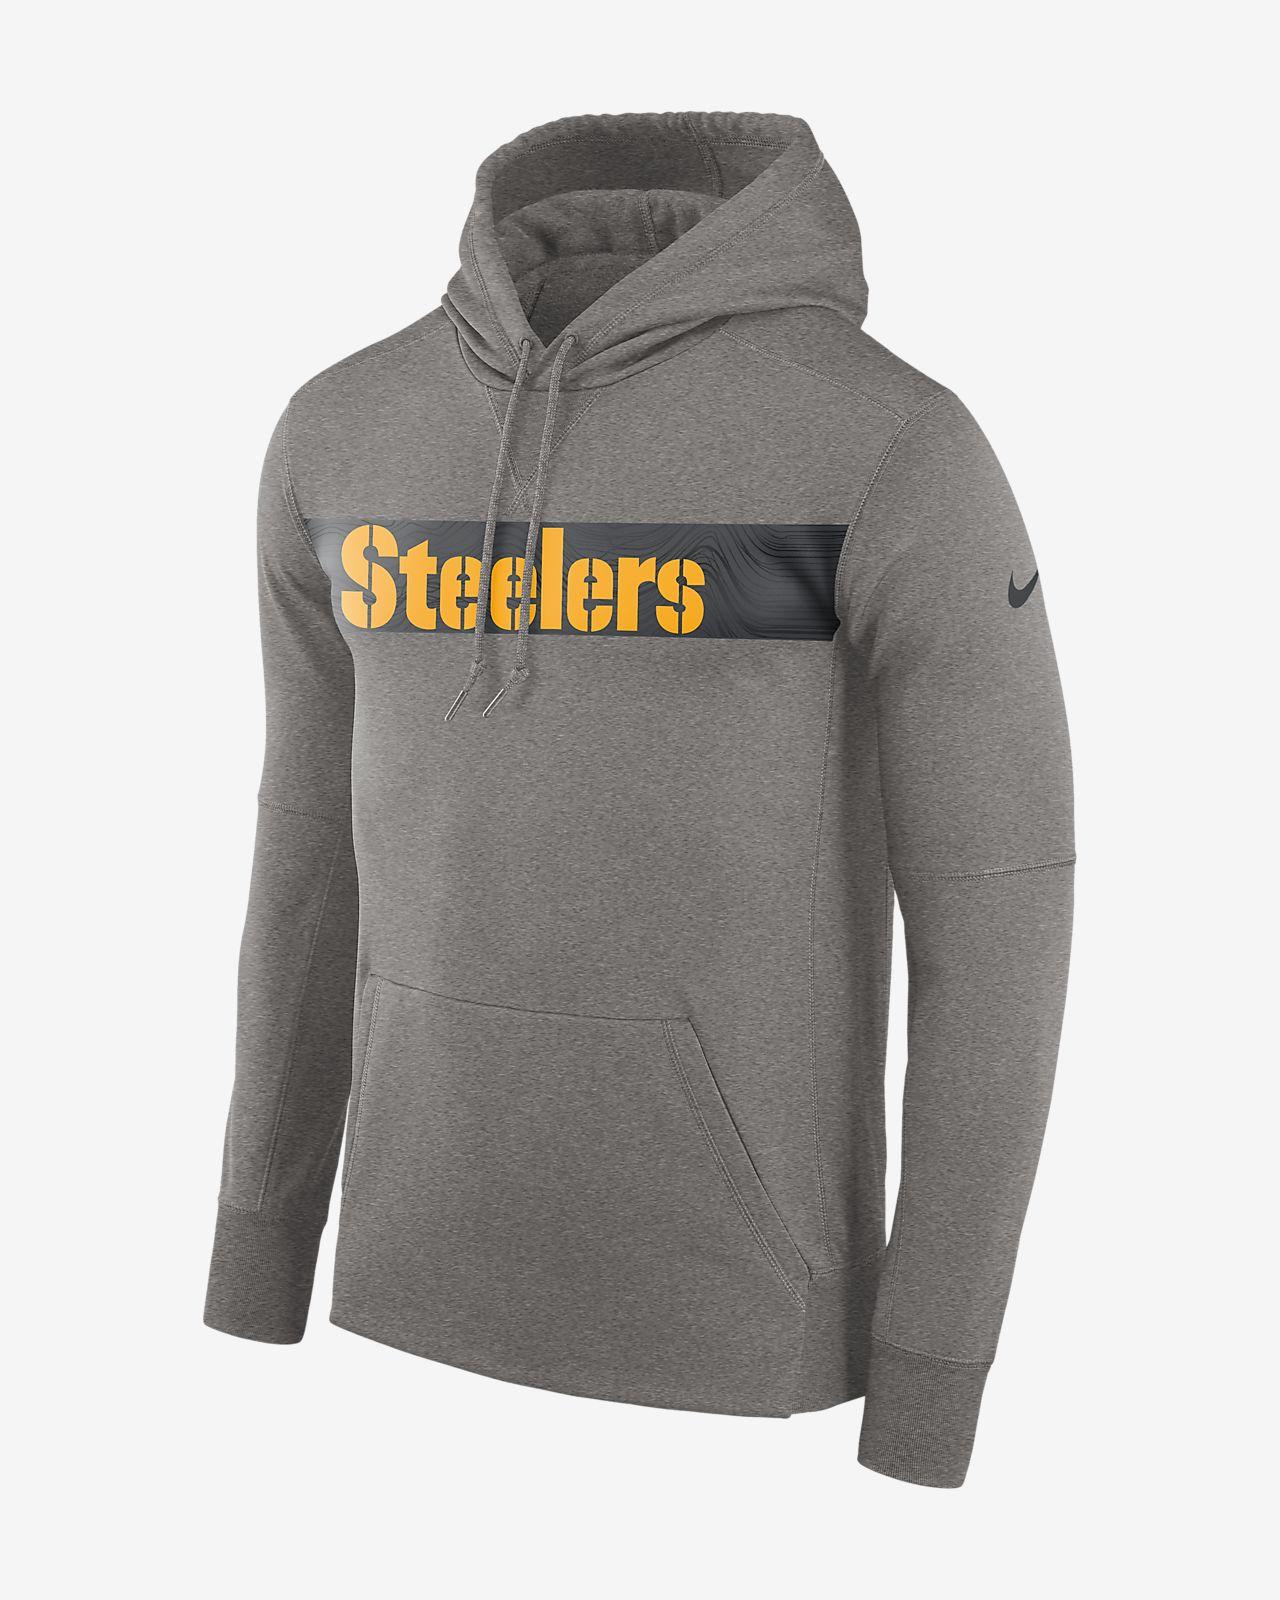 b802e2794c9d Nike Dri-FIT Therma (NFL Steelers) Men s Pullover Hoodie. Nike.com